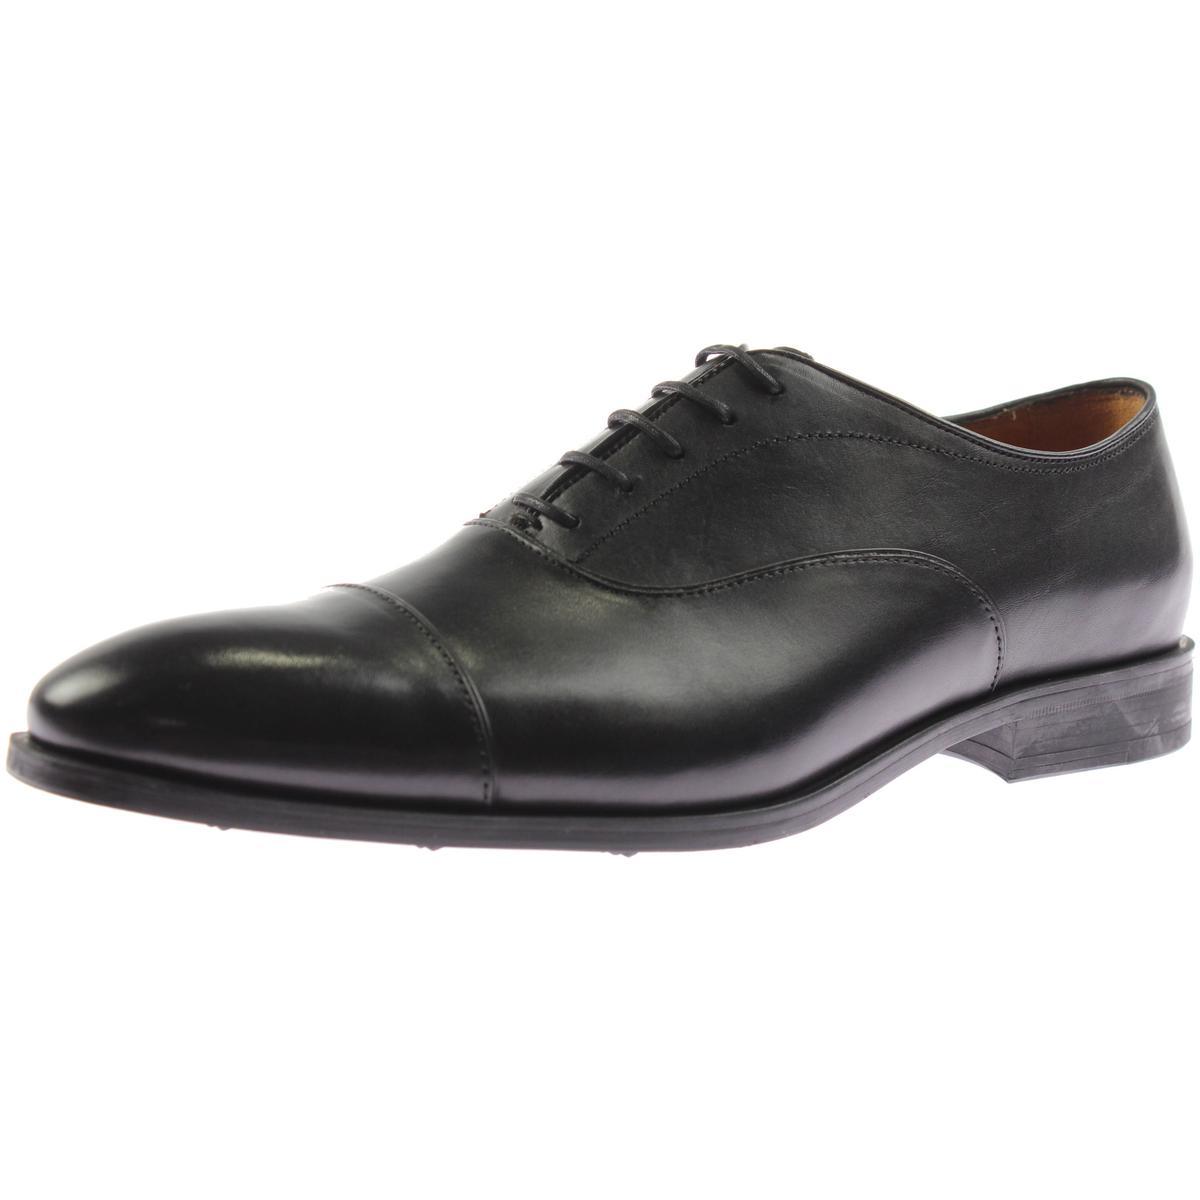 zara 5246 mens black leather formal oxfords shoes 9 medium